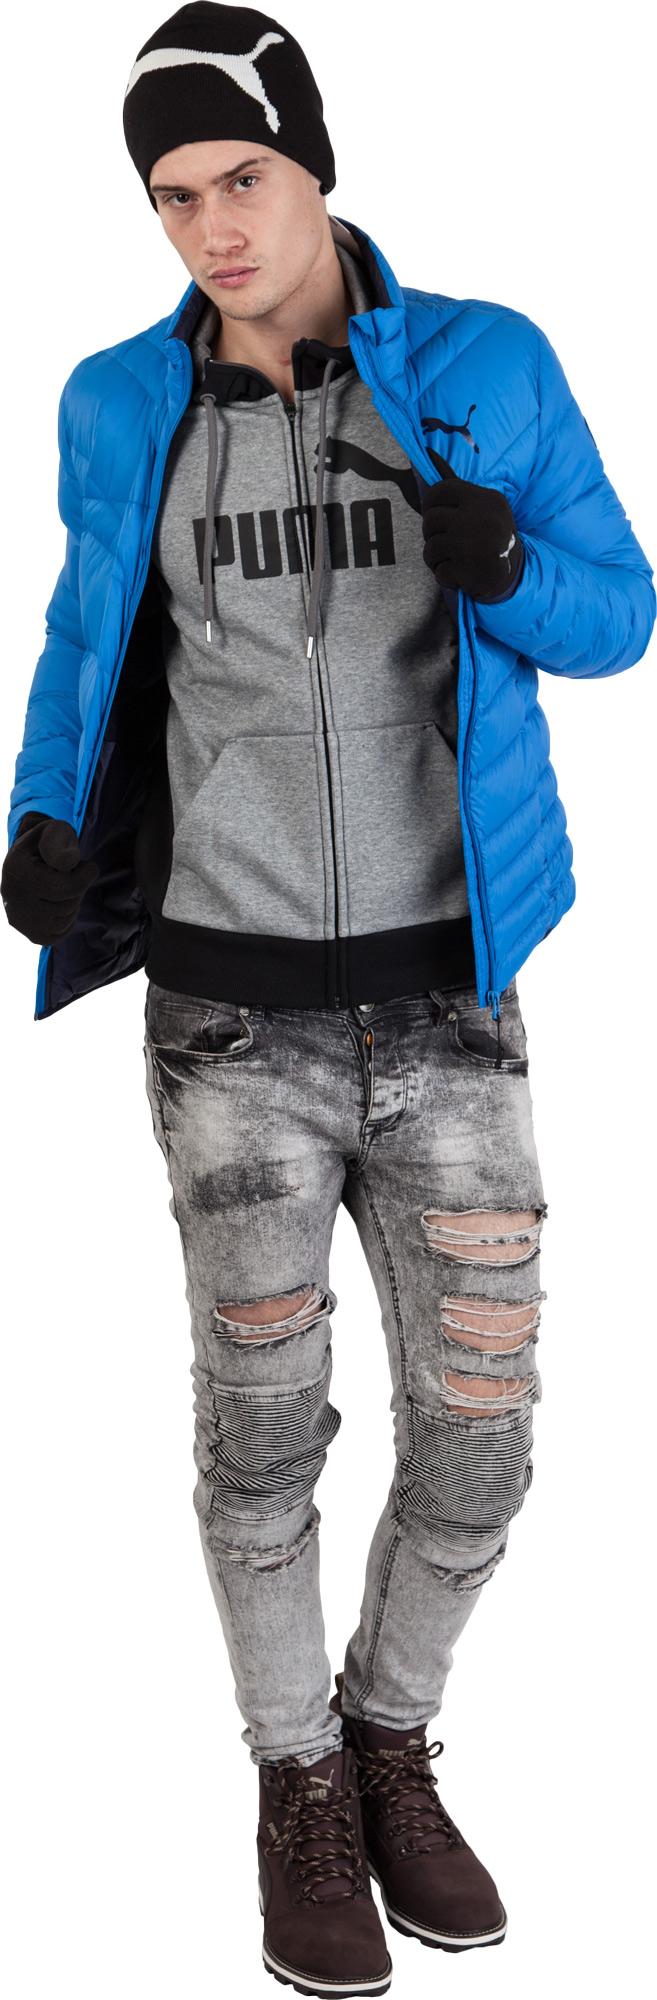 Puma ESS NO.1 LOGO FZ HOODY FL. Men s modern sweatshirt. Men s modern  sweatshirt bea828c2d4